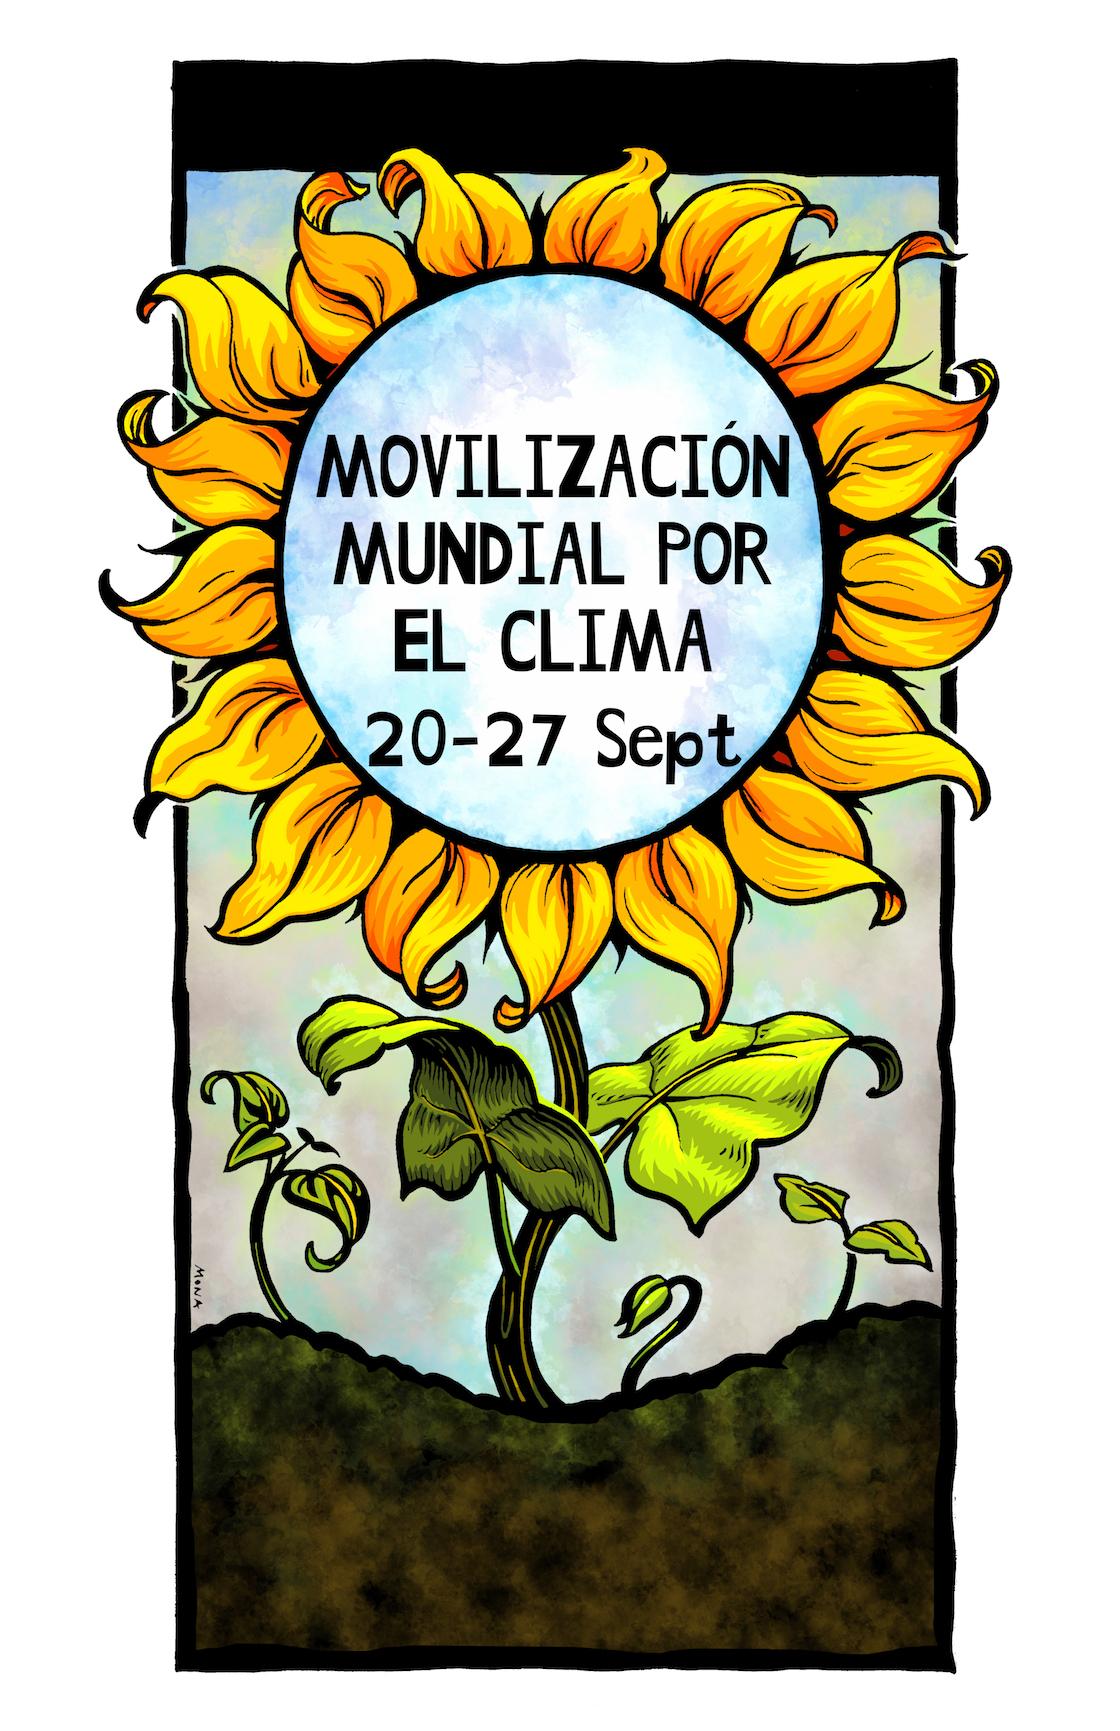 posters-carteles-imagenes-hueñga-clima-fridays-future-greta-06